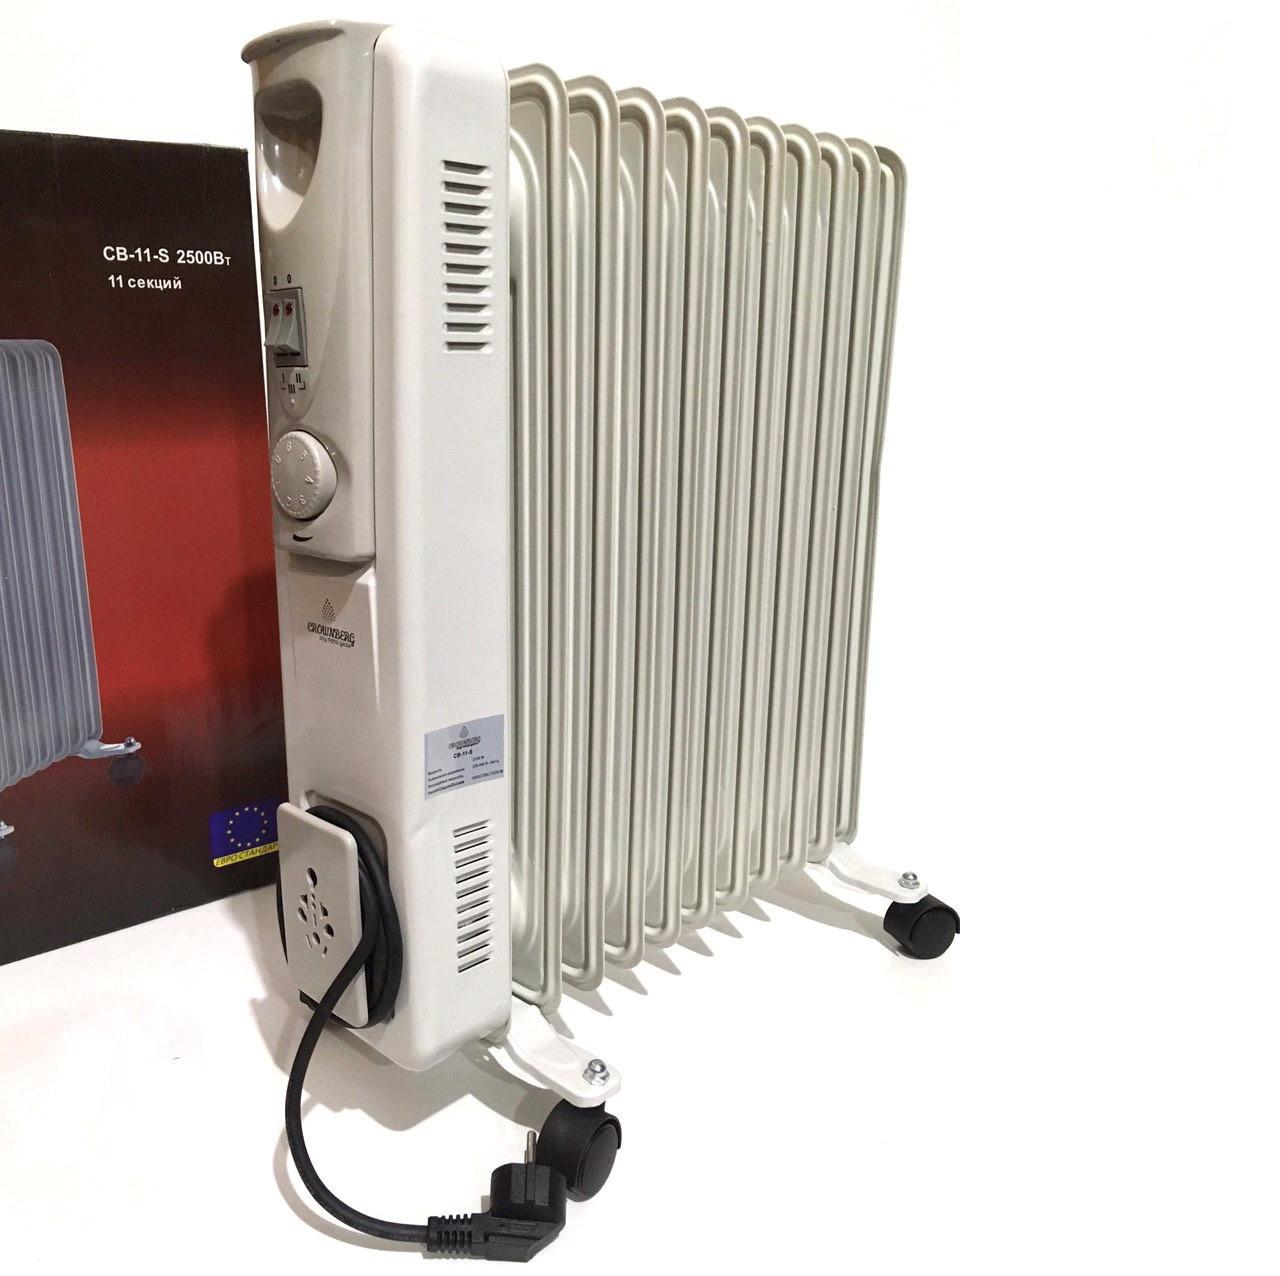 Радиатор масляный Crownberg CB-11-S 2500 Вт 11 секций